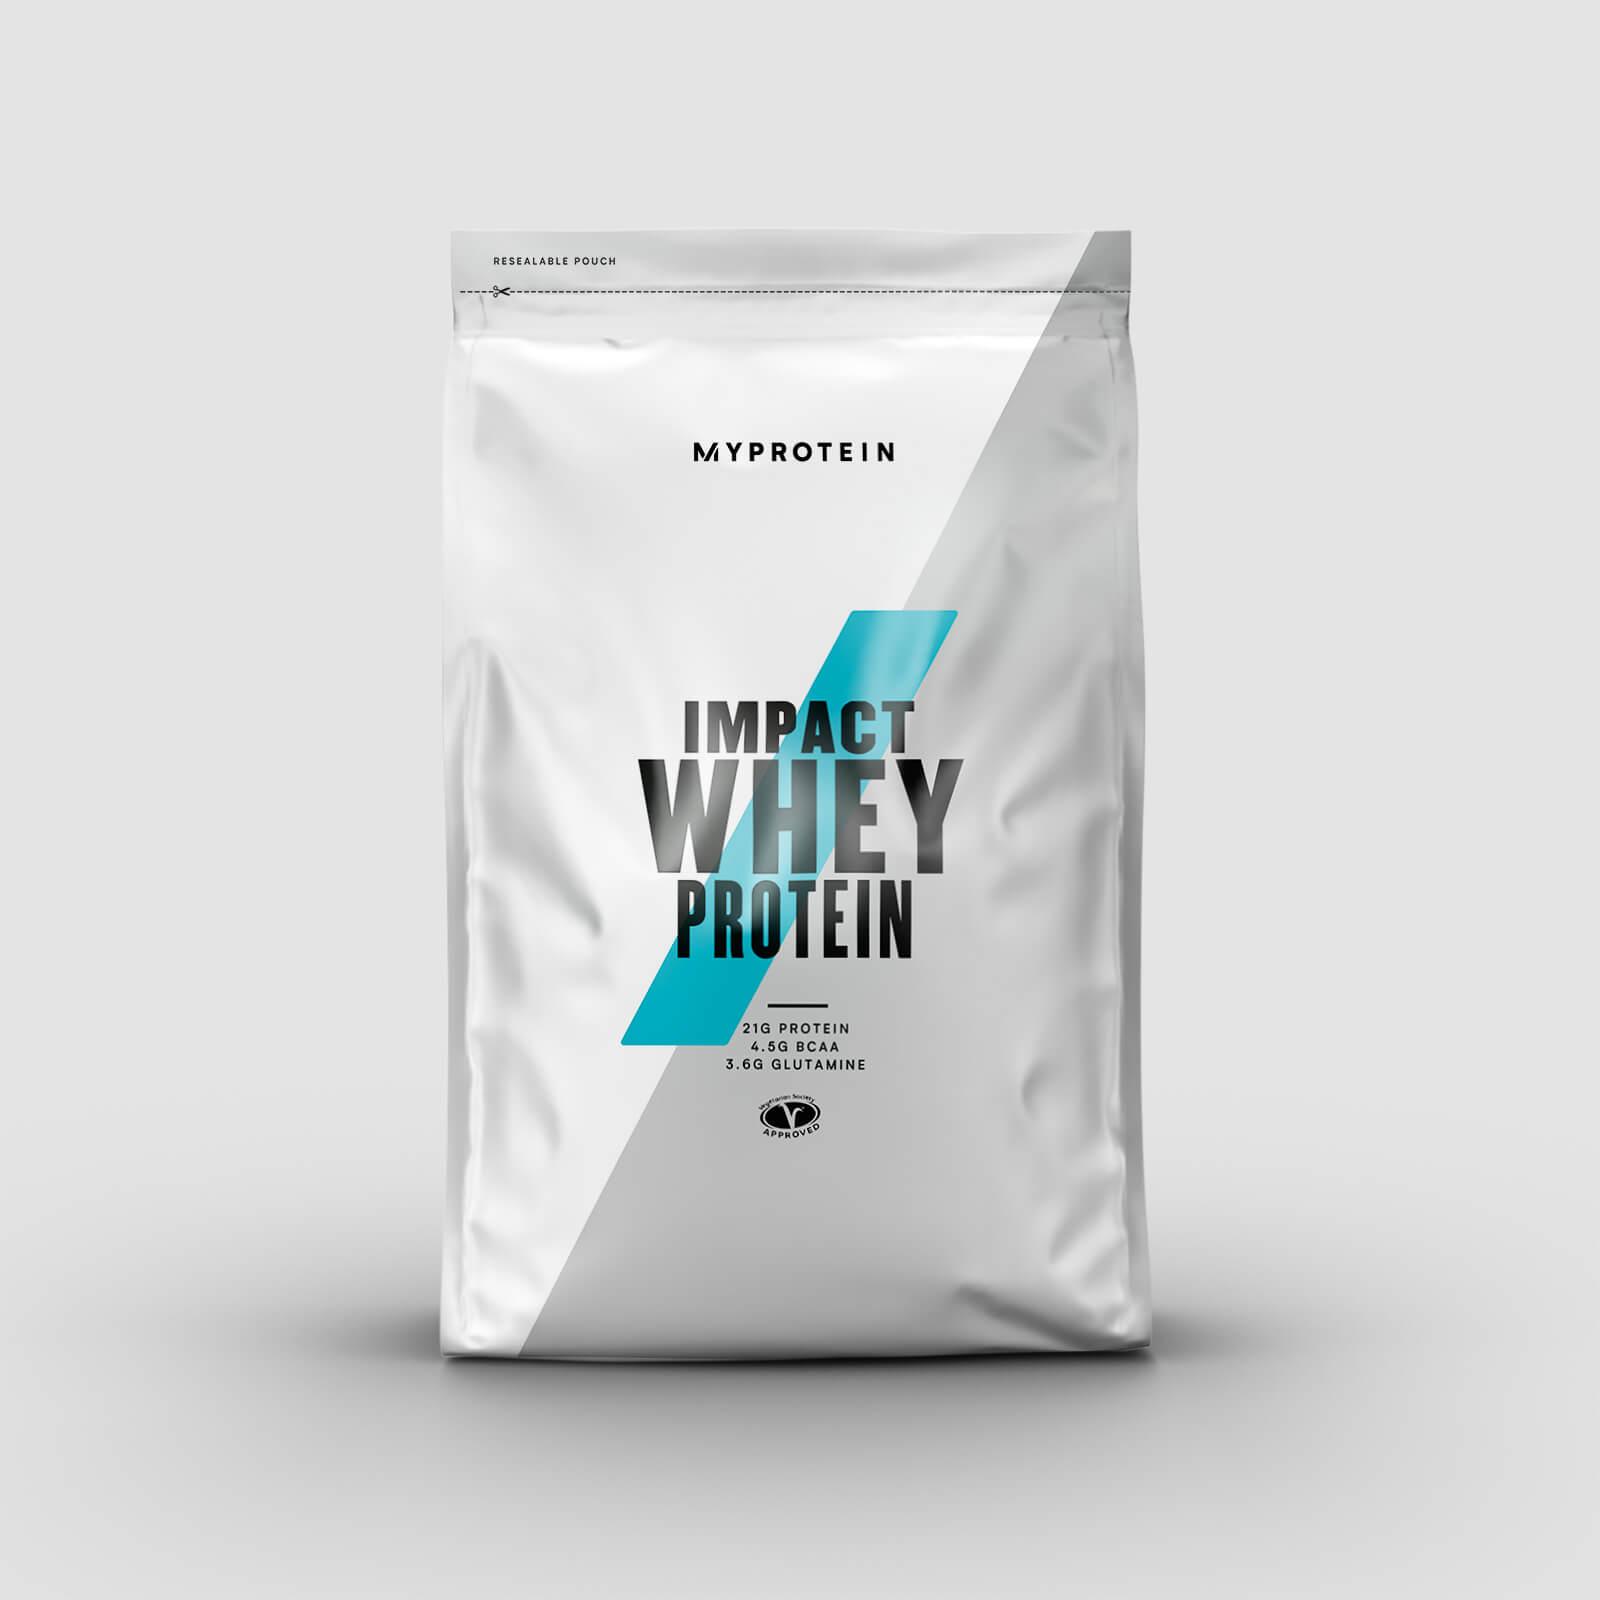 Myprotein Impact Whey Protein - 1kg - Liquorice